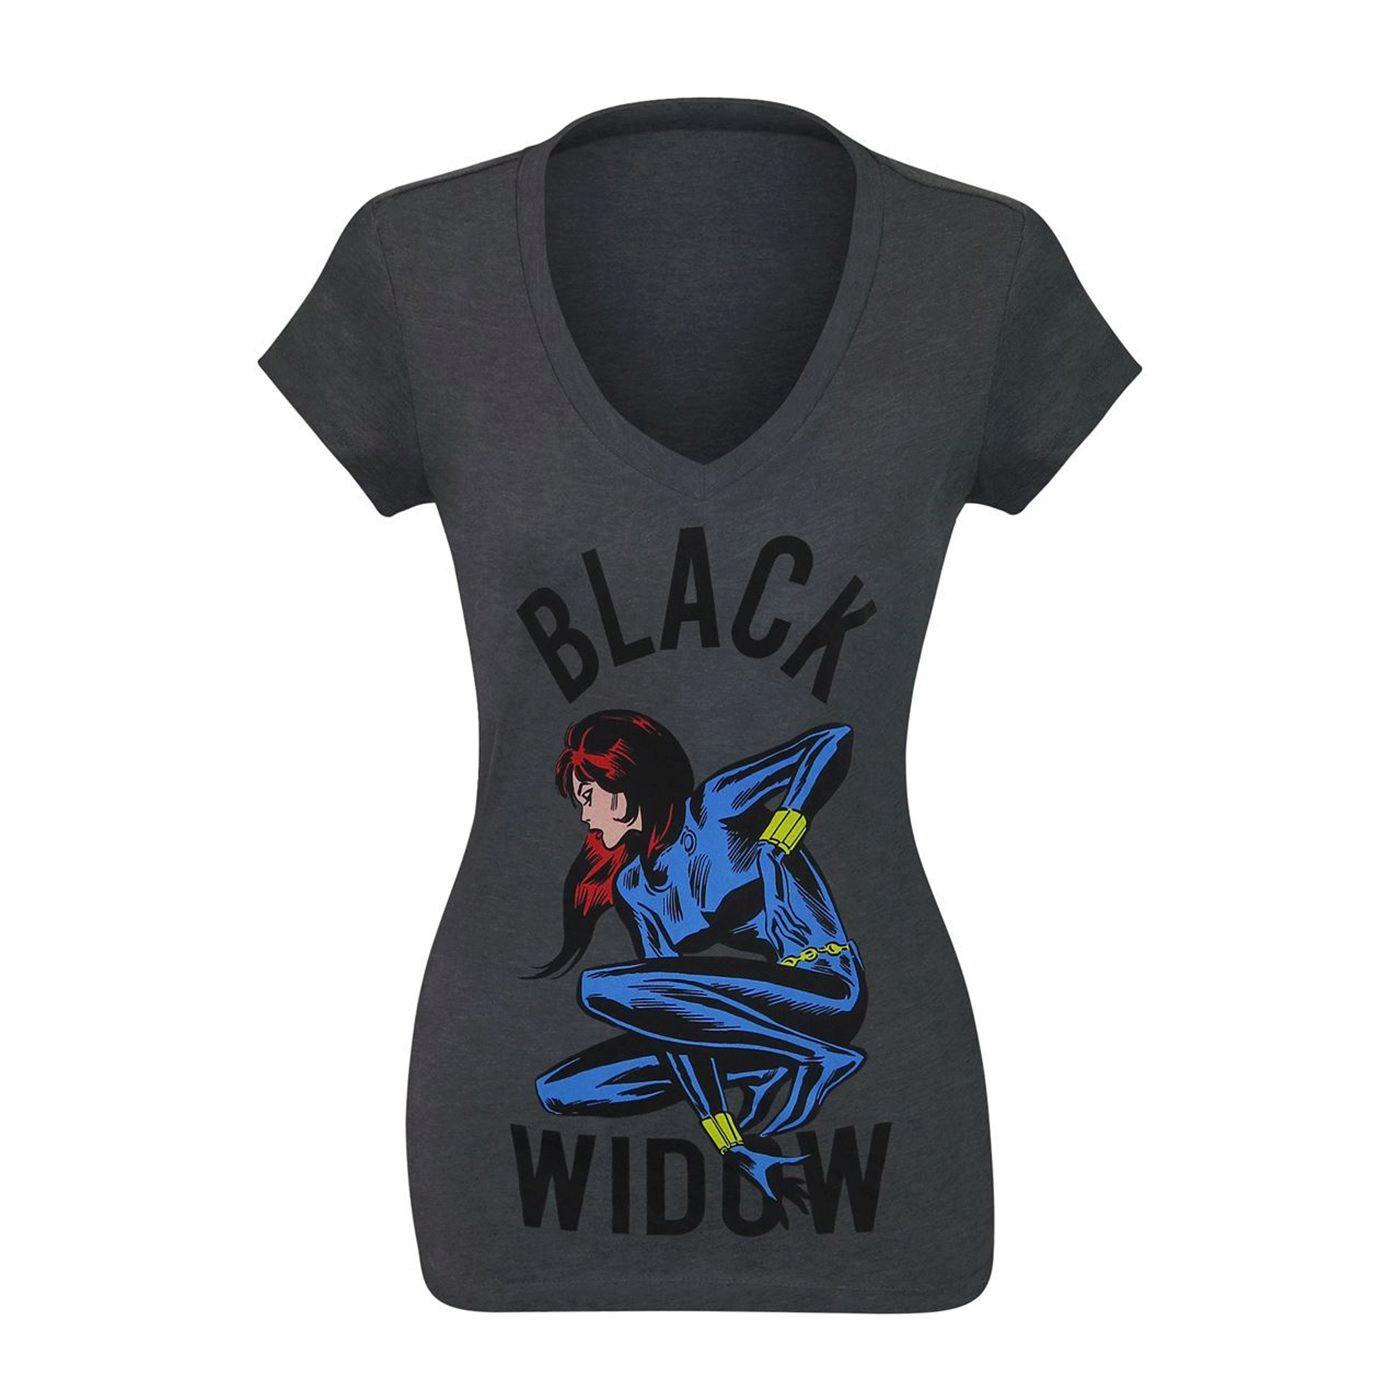 Black Widow Crouching Women's V-Neck T-Shirt